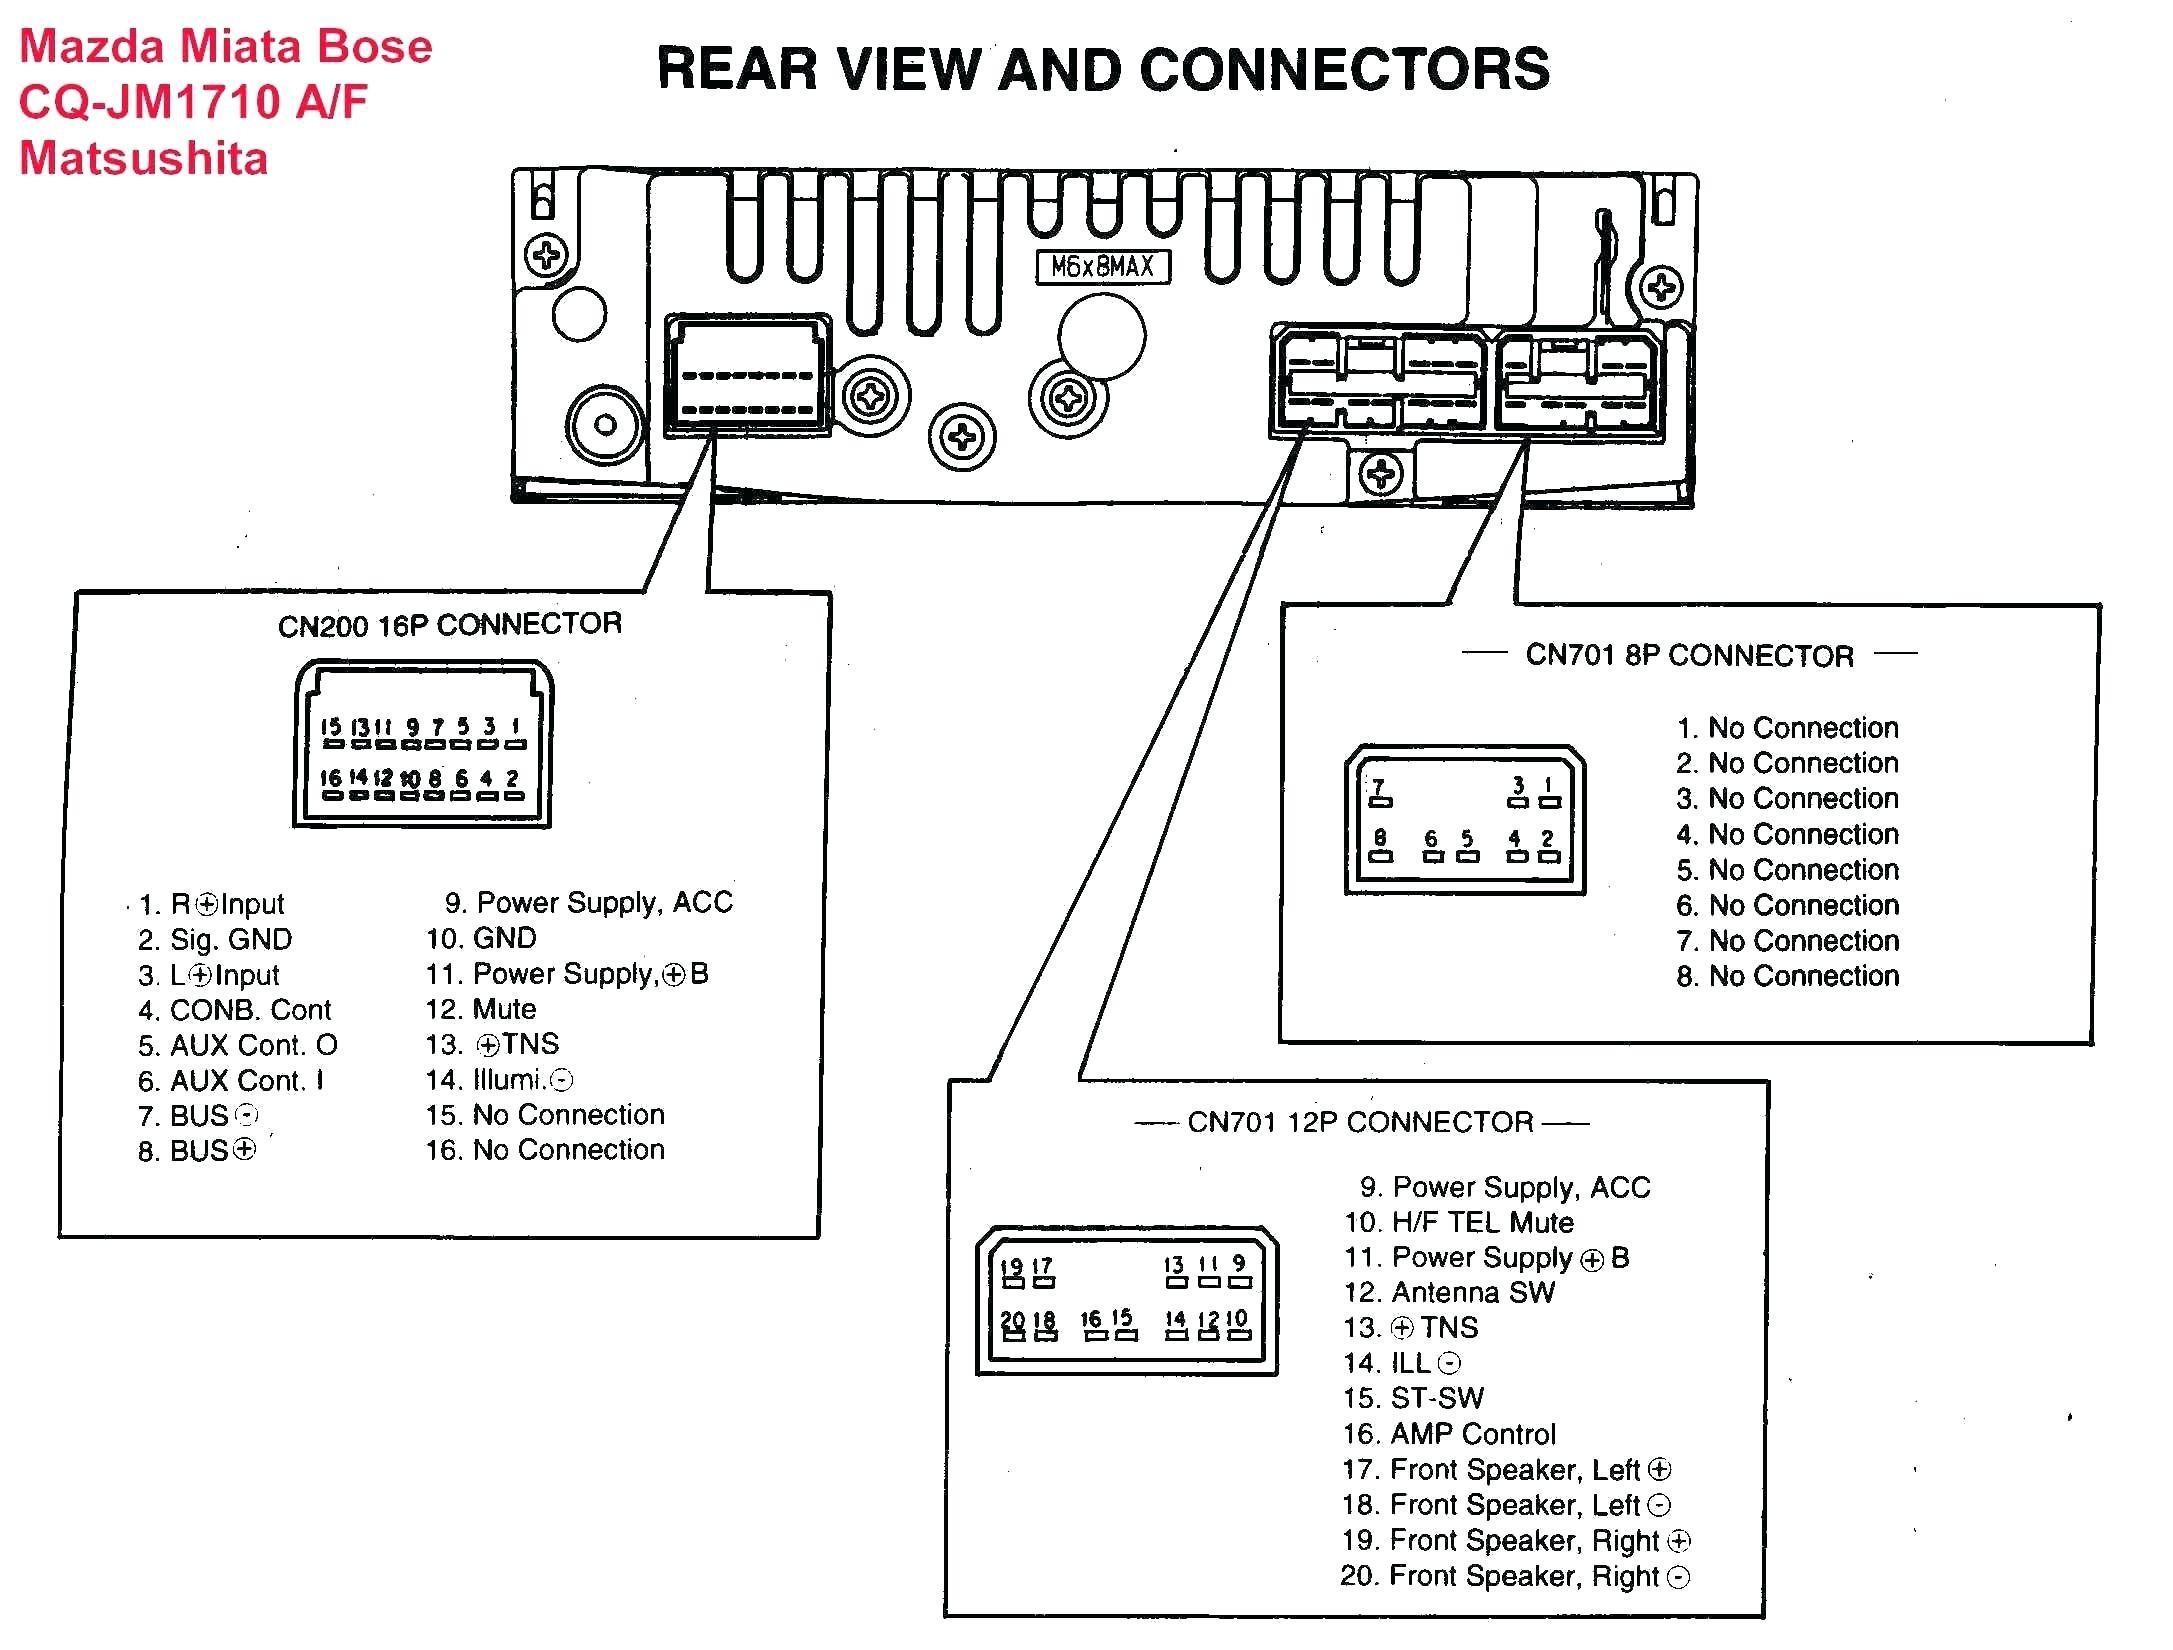 Pioneer Car Stereo Wiring Diagram Car Audio Wire Diagram Of Pioneer Car Stereo Wiring Diagram